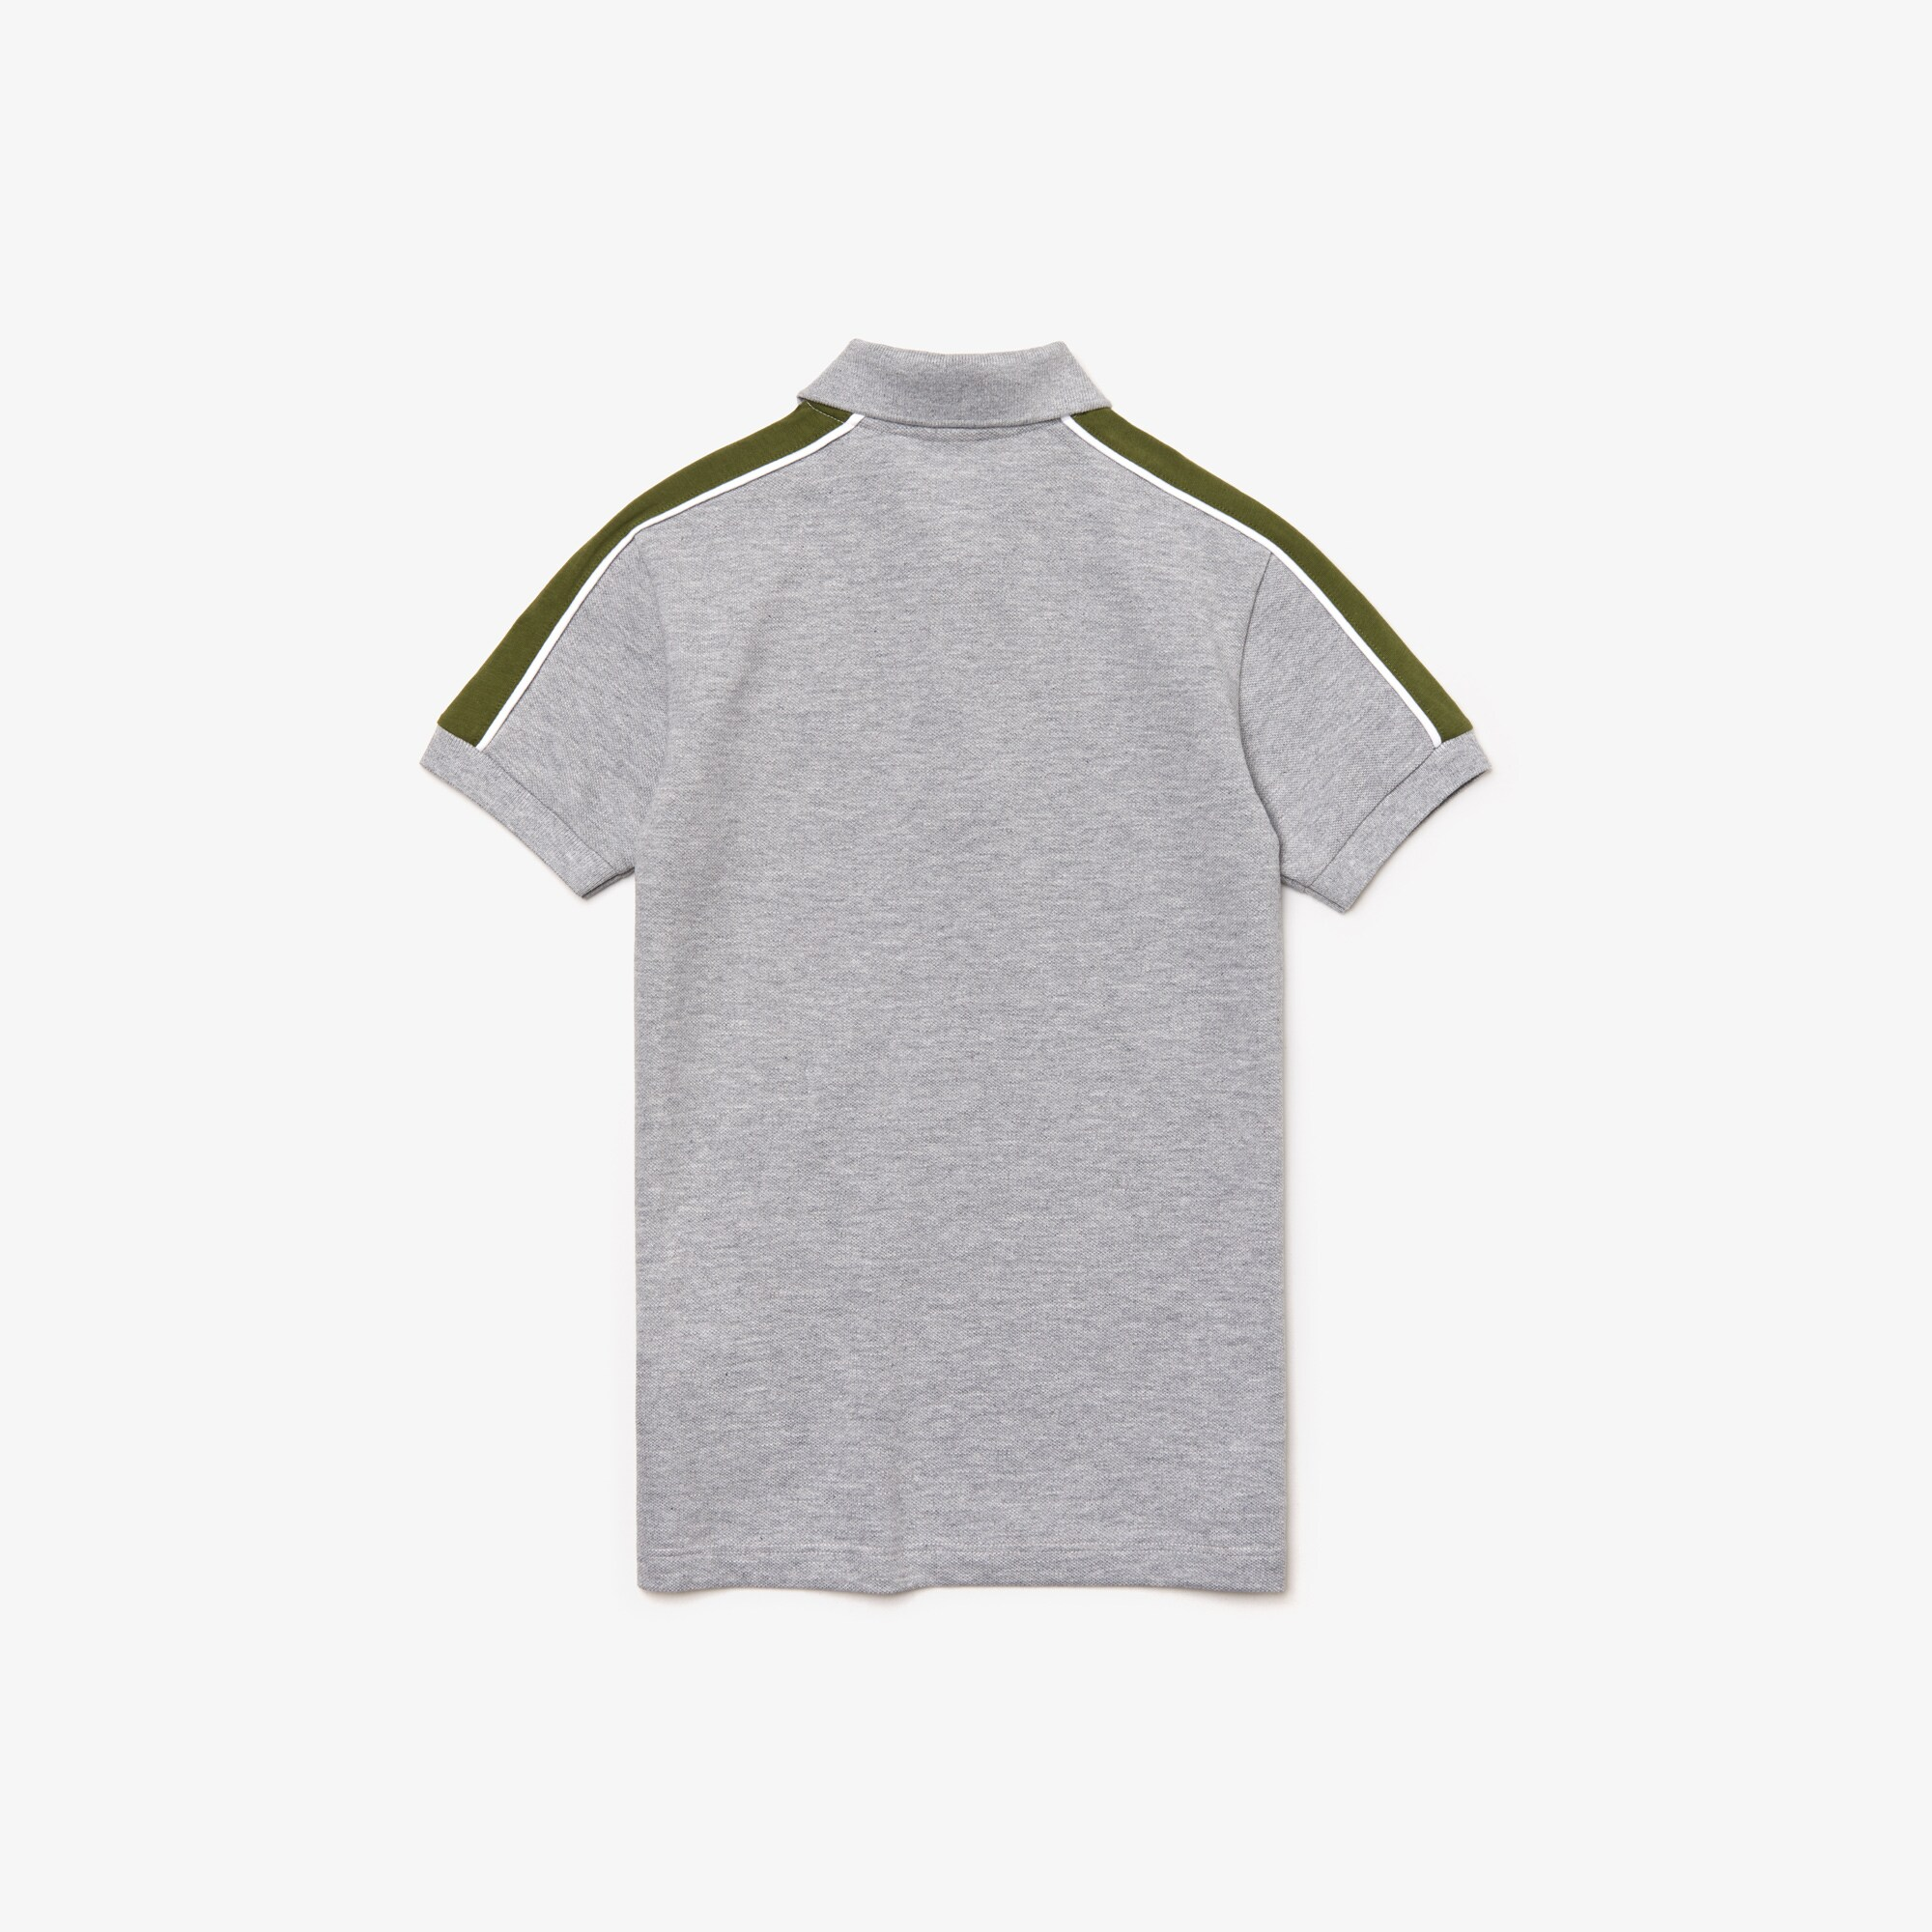 Aus Colorblock Lacoste Jungen Piqué Design Poloshirt Im Petit CxerdBo